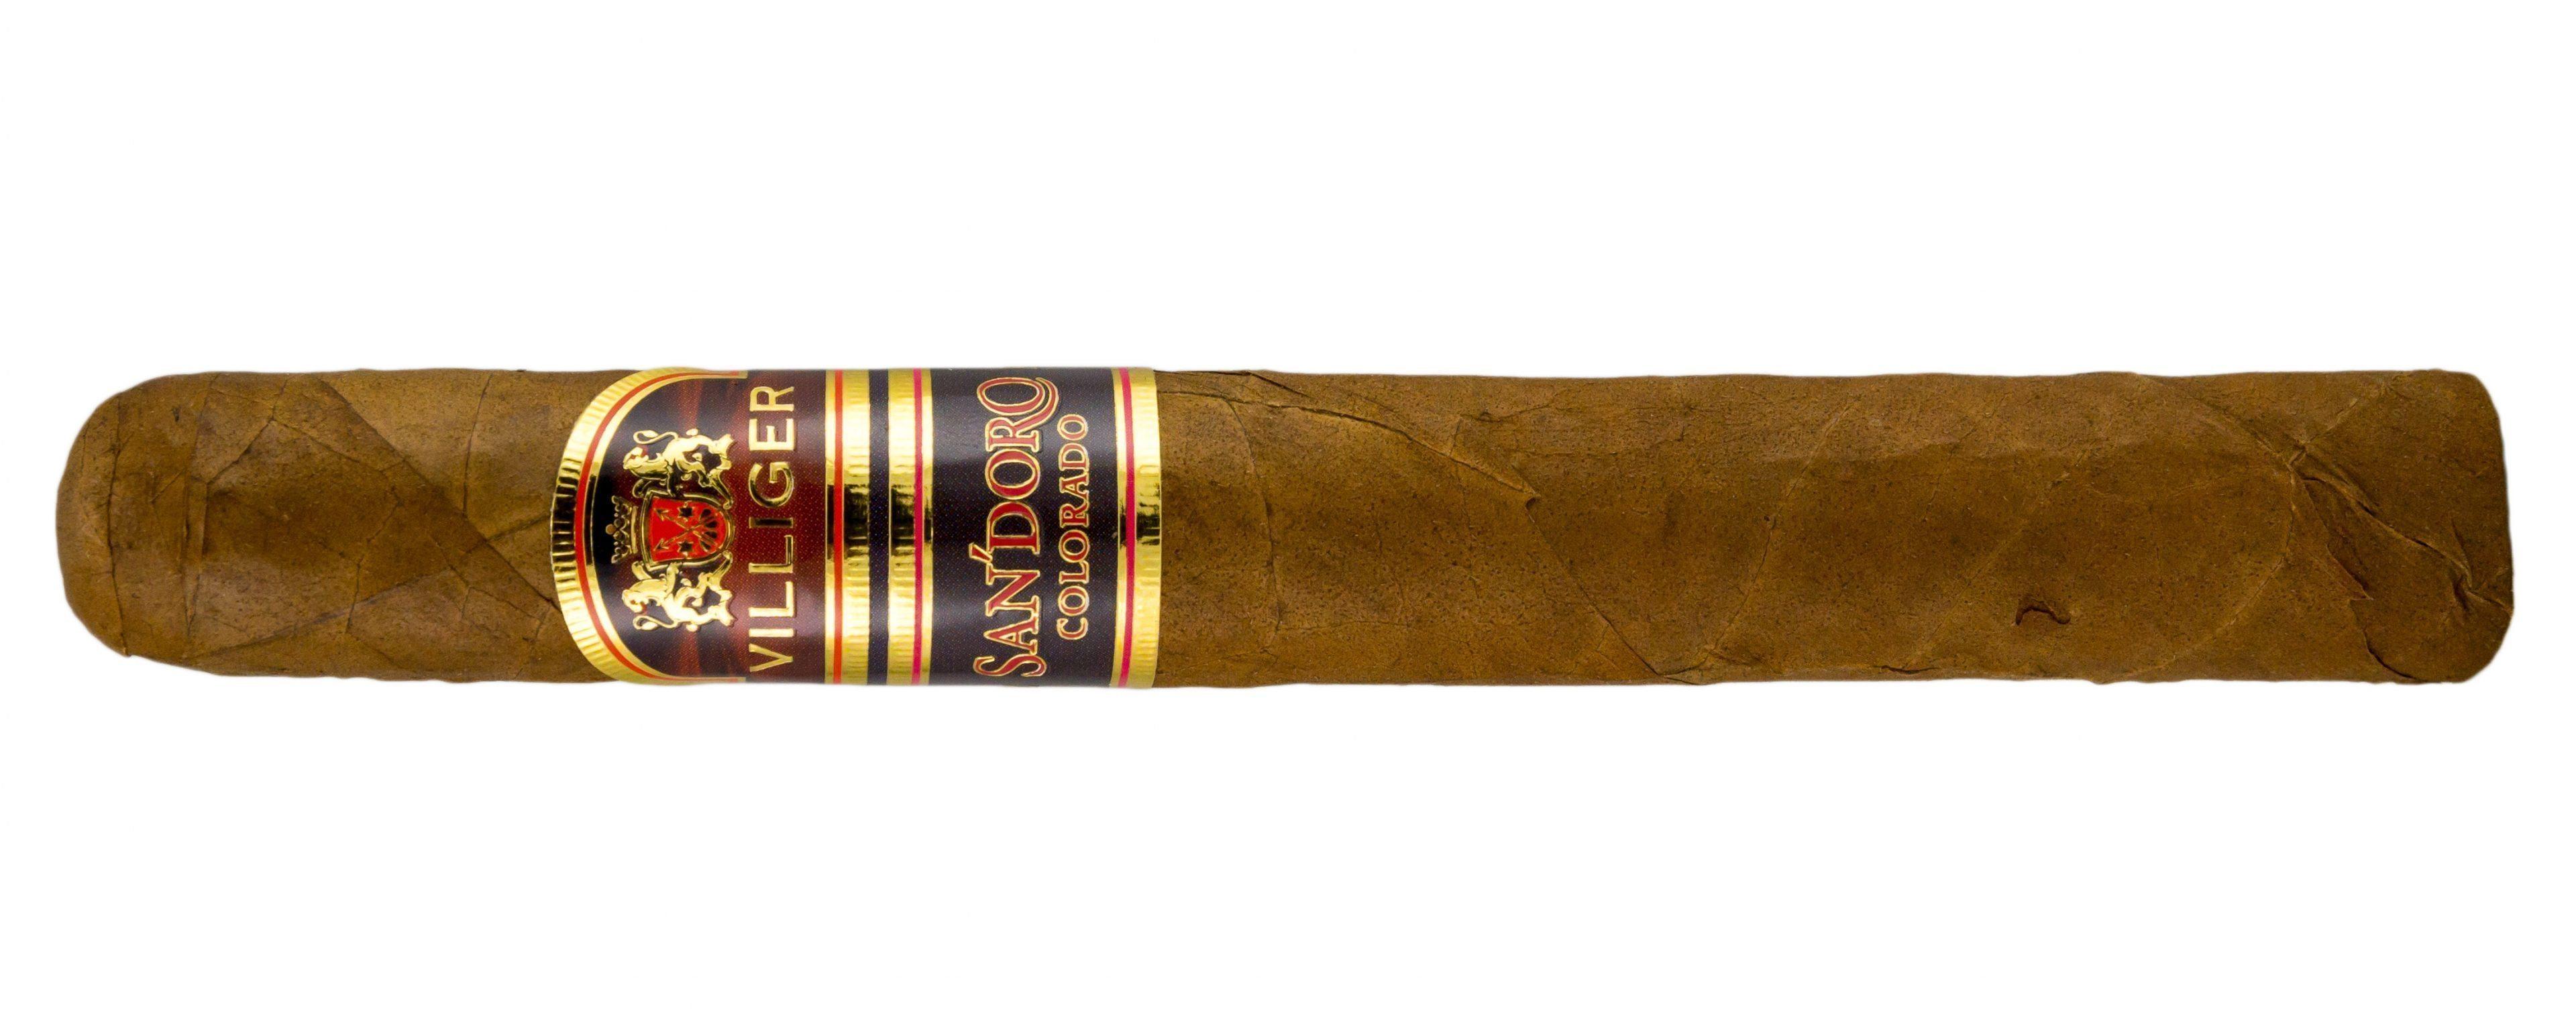 Blind Cigar Review: Villiger | San'Doro Colorado Toro